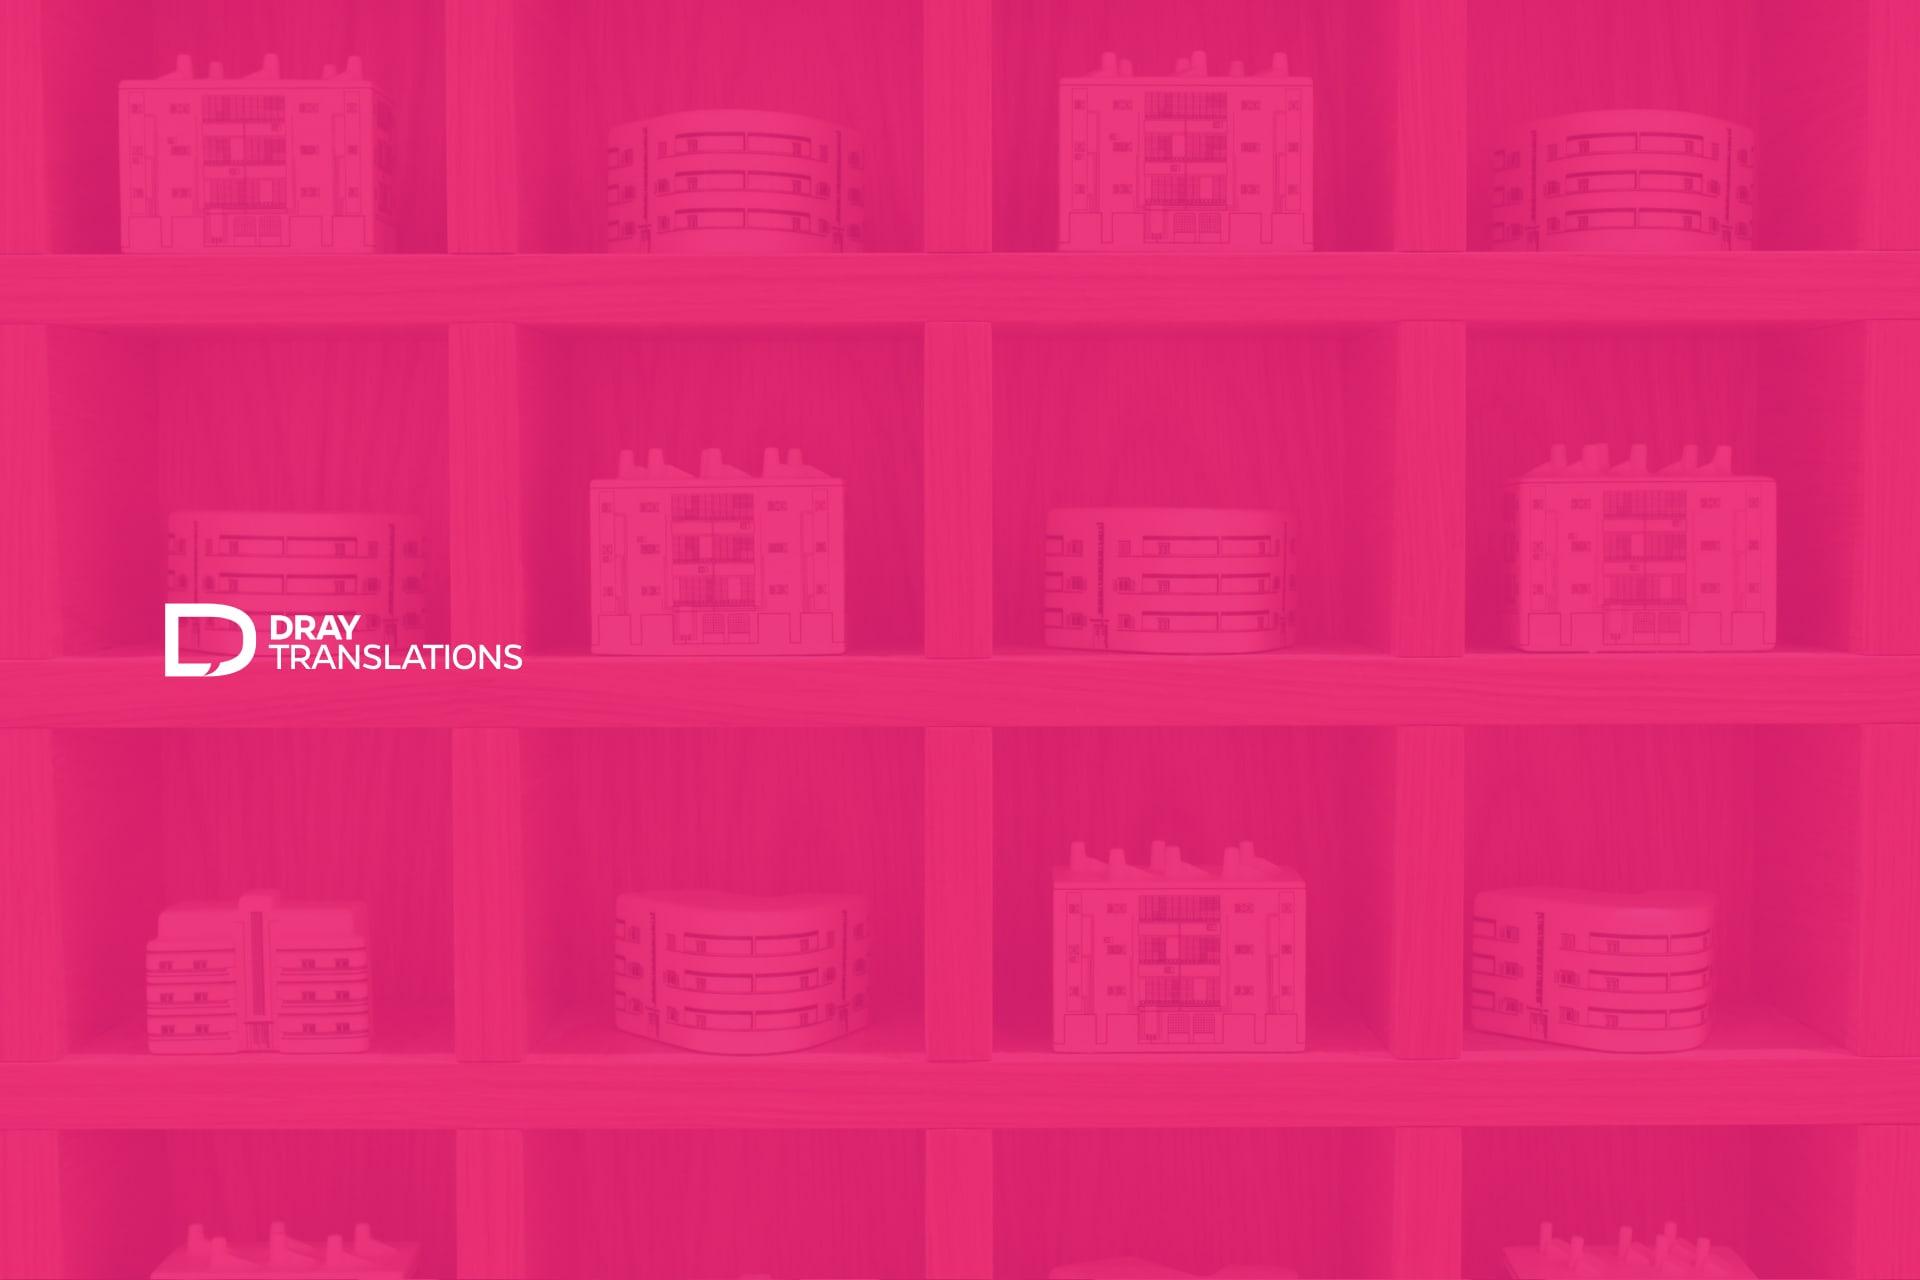 Dray_banner1 - Natie Branding Agency